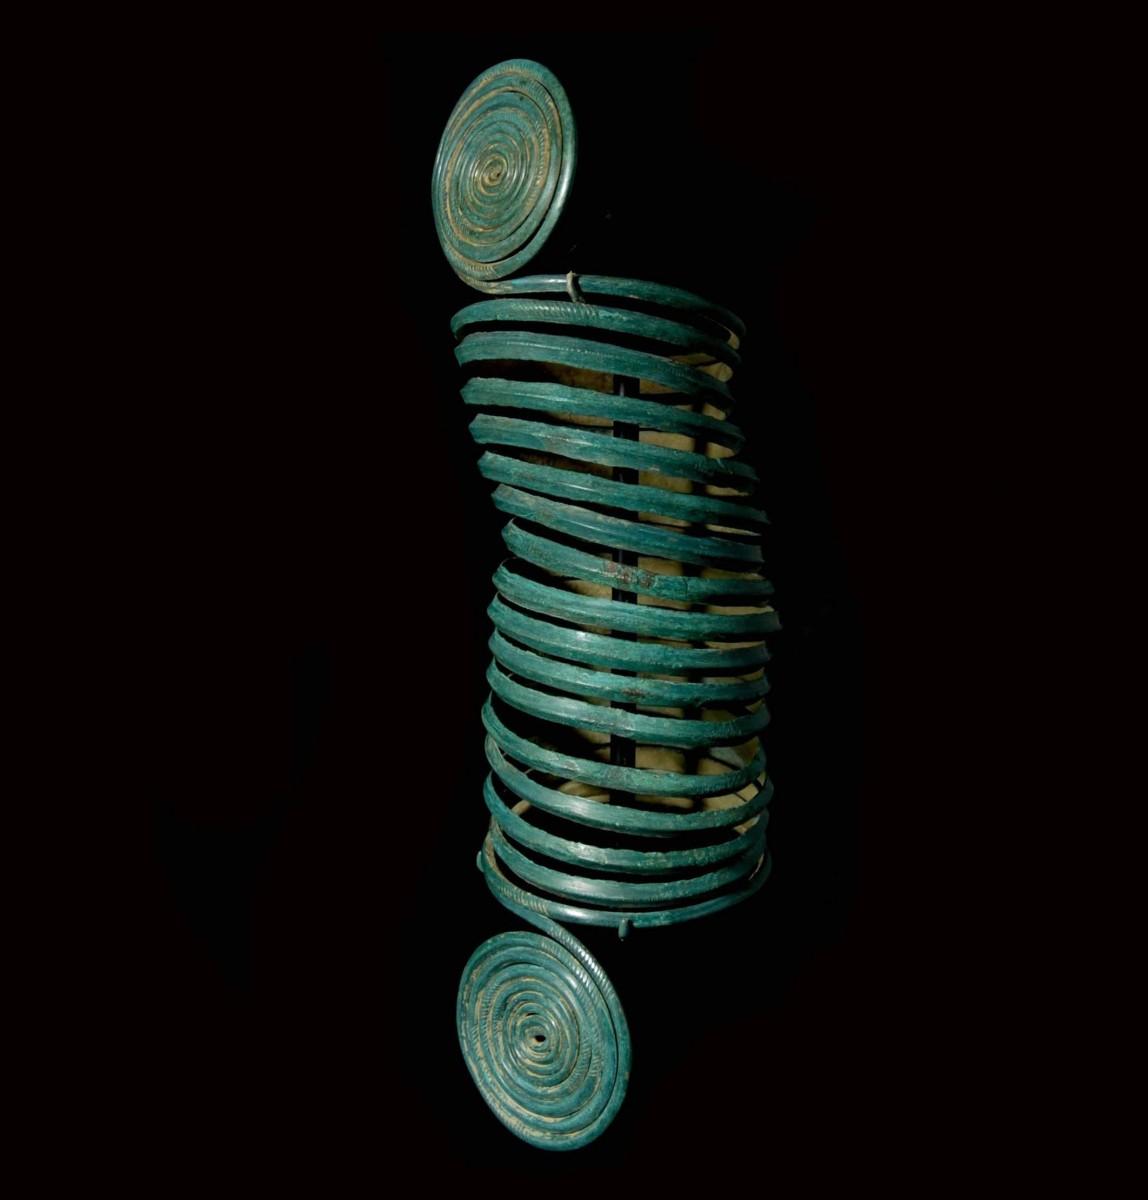 Central European Copper Alloy Spiral Arm-Band left